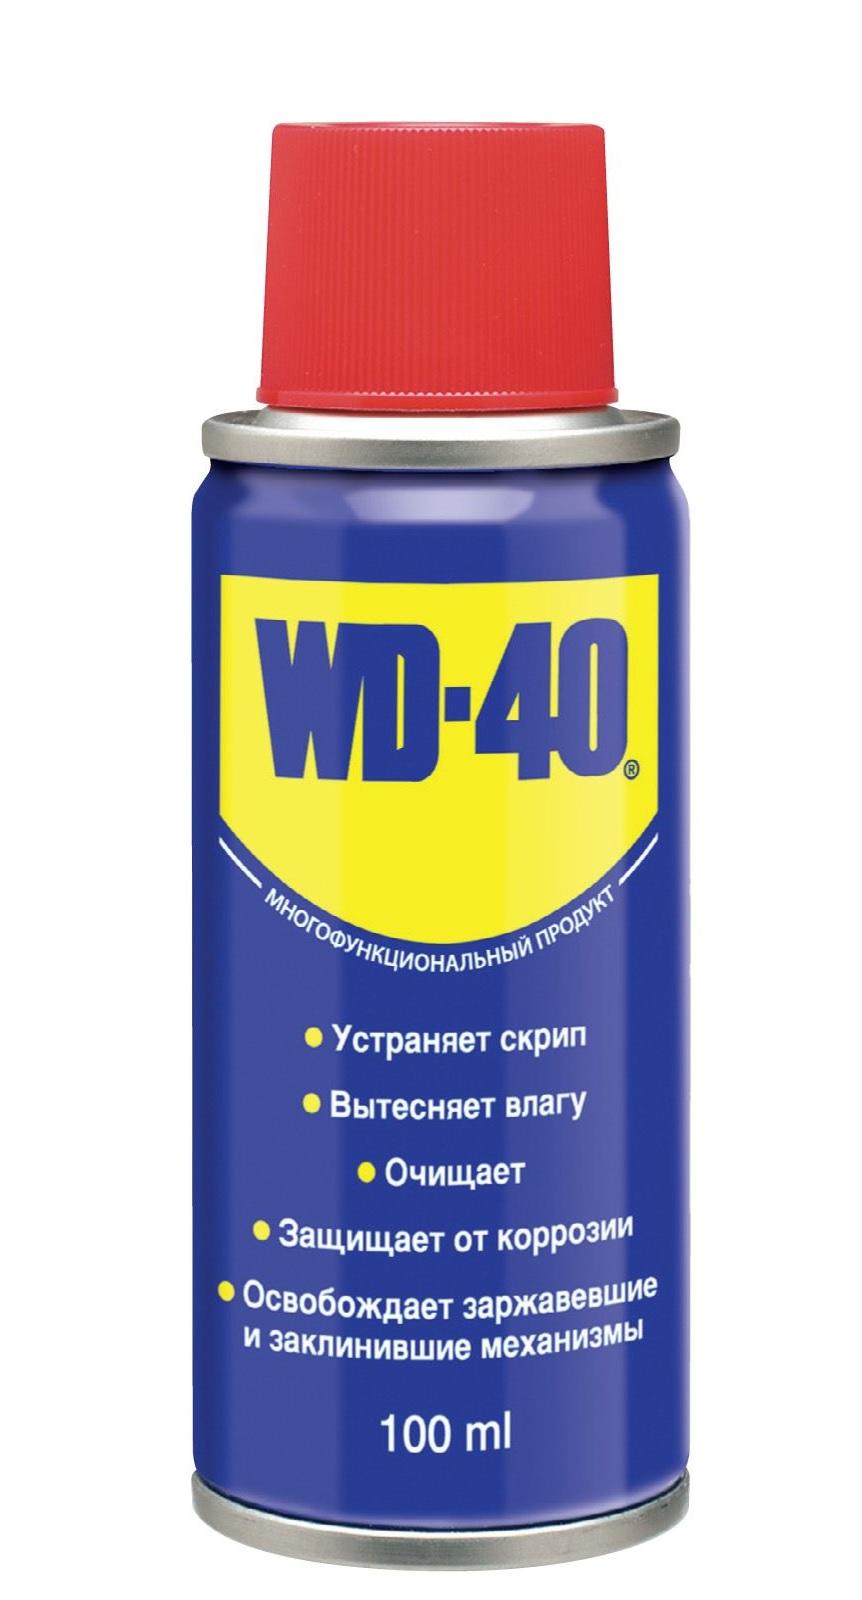 Lubrifiant multifunctional WD-40 100 ml + 50 ml gratis